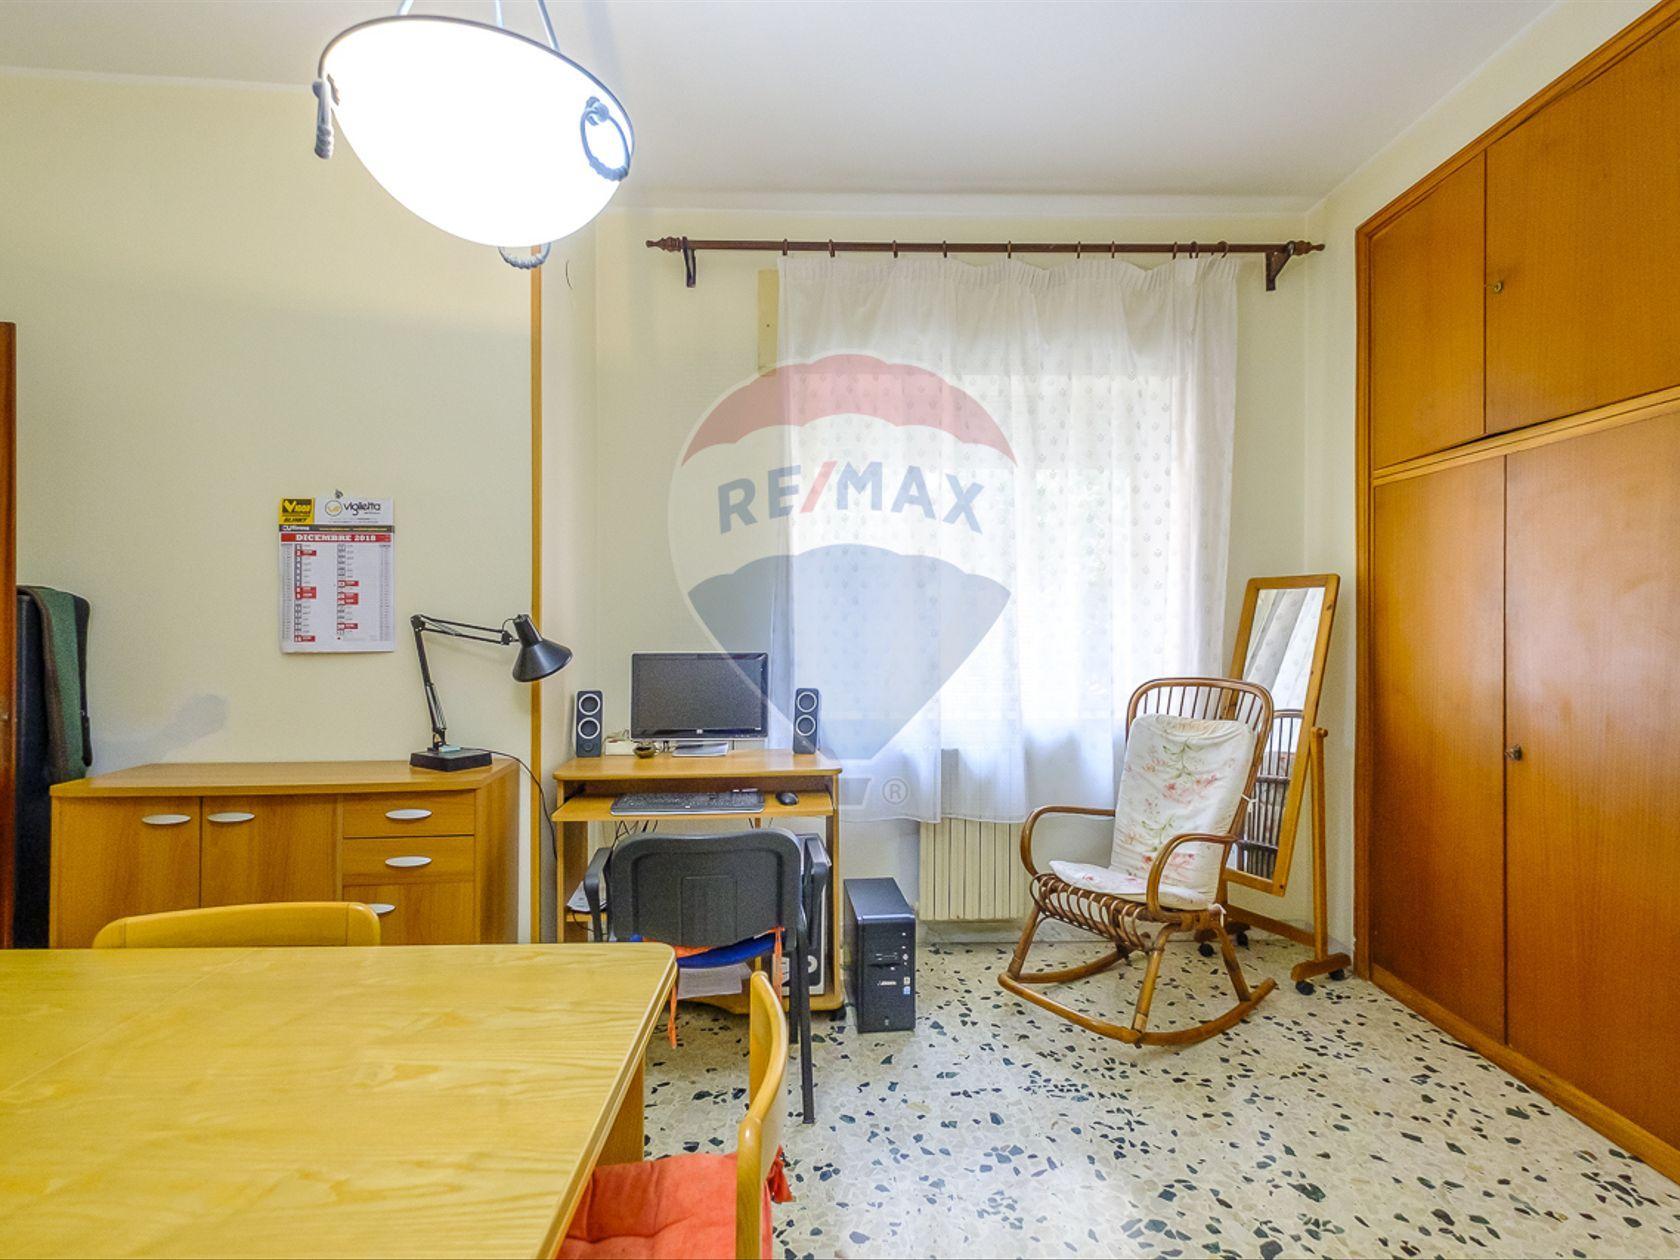 Appartamento Siracusa- Scala Greca S. Panagia Teracati Zecchino, Siracusa, SR Vendita - Foto 7